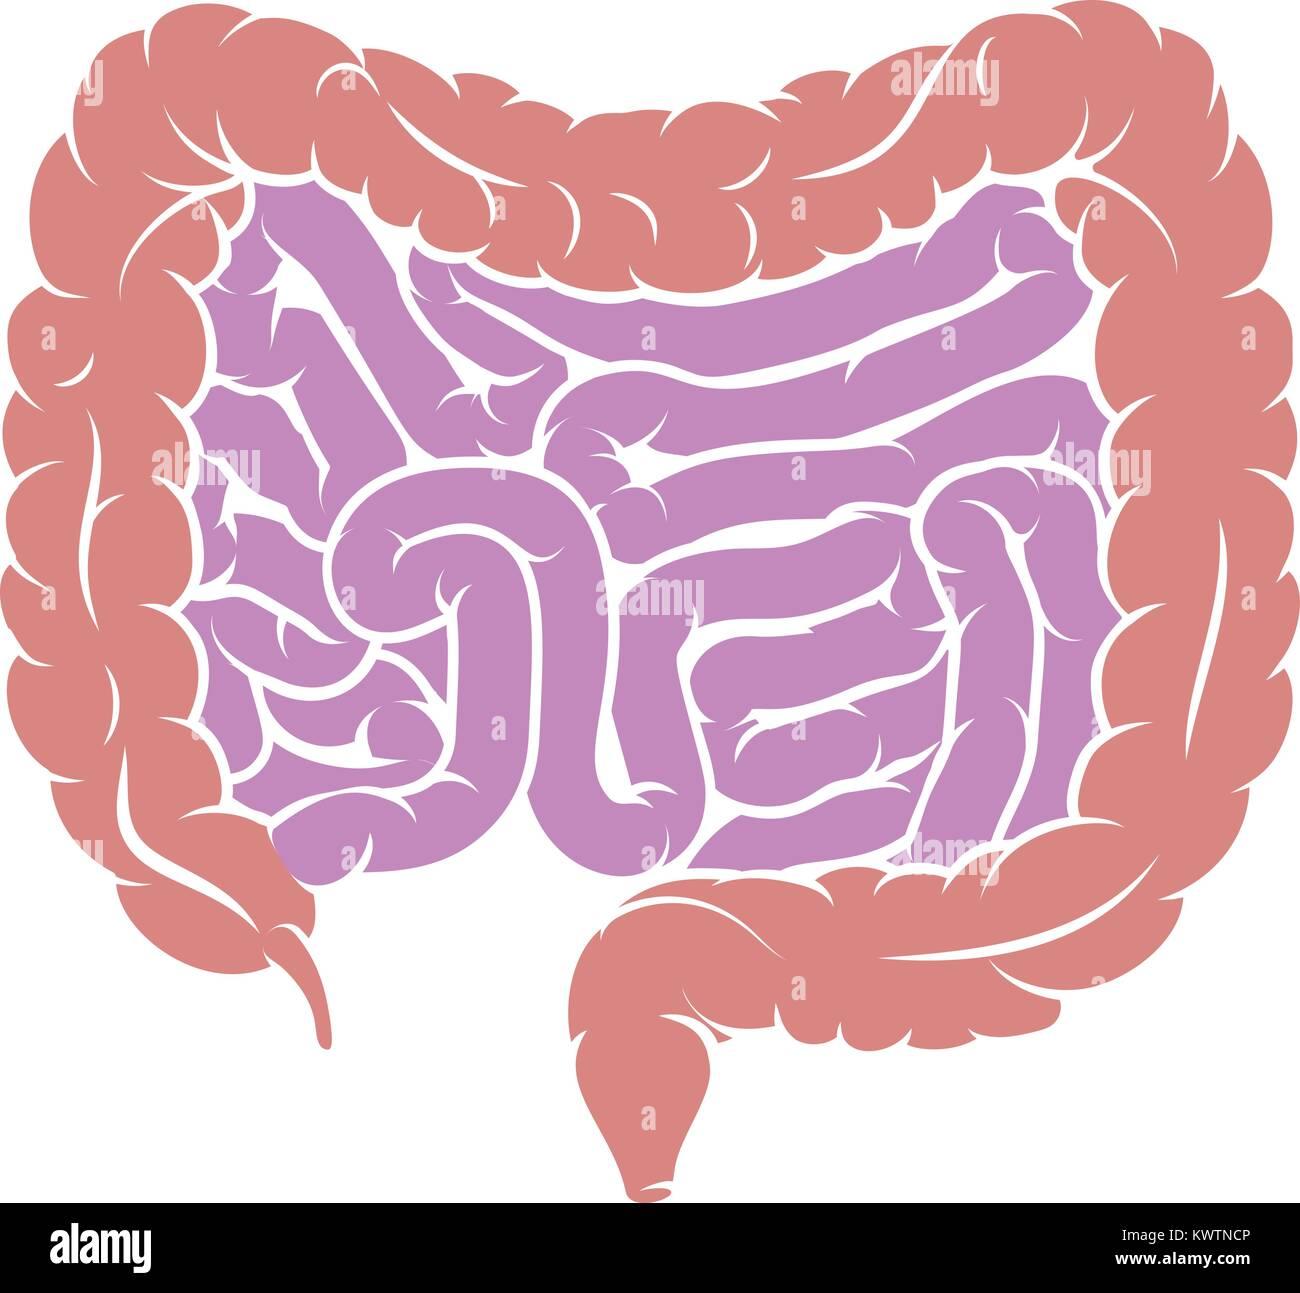 Digestive System Cartoon Imágenes De Stock & Digestive System ...